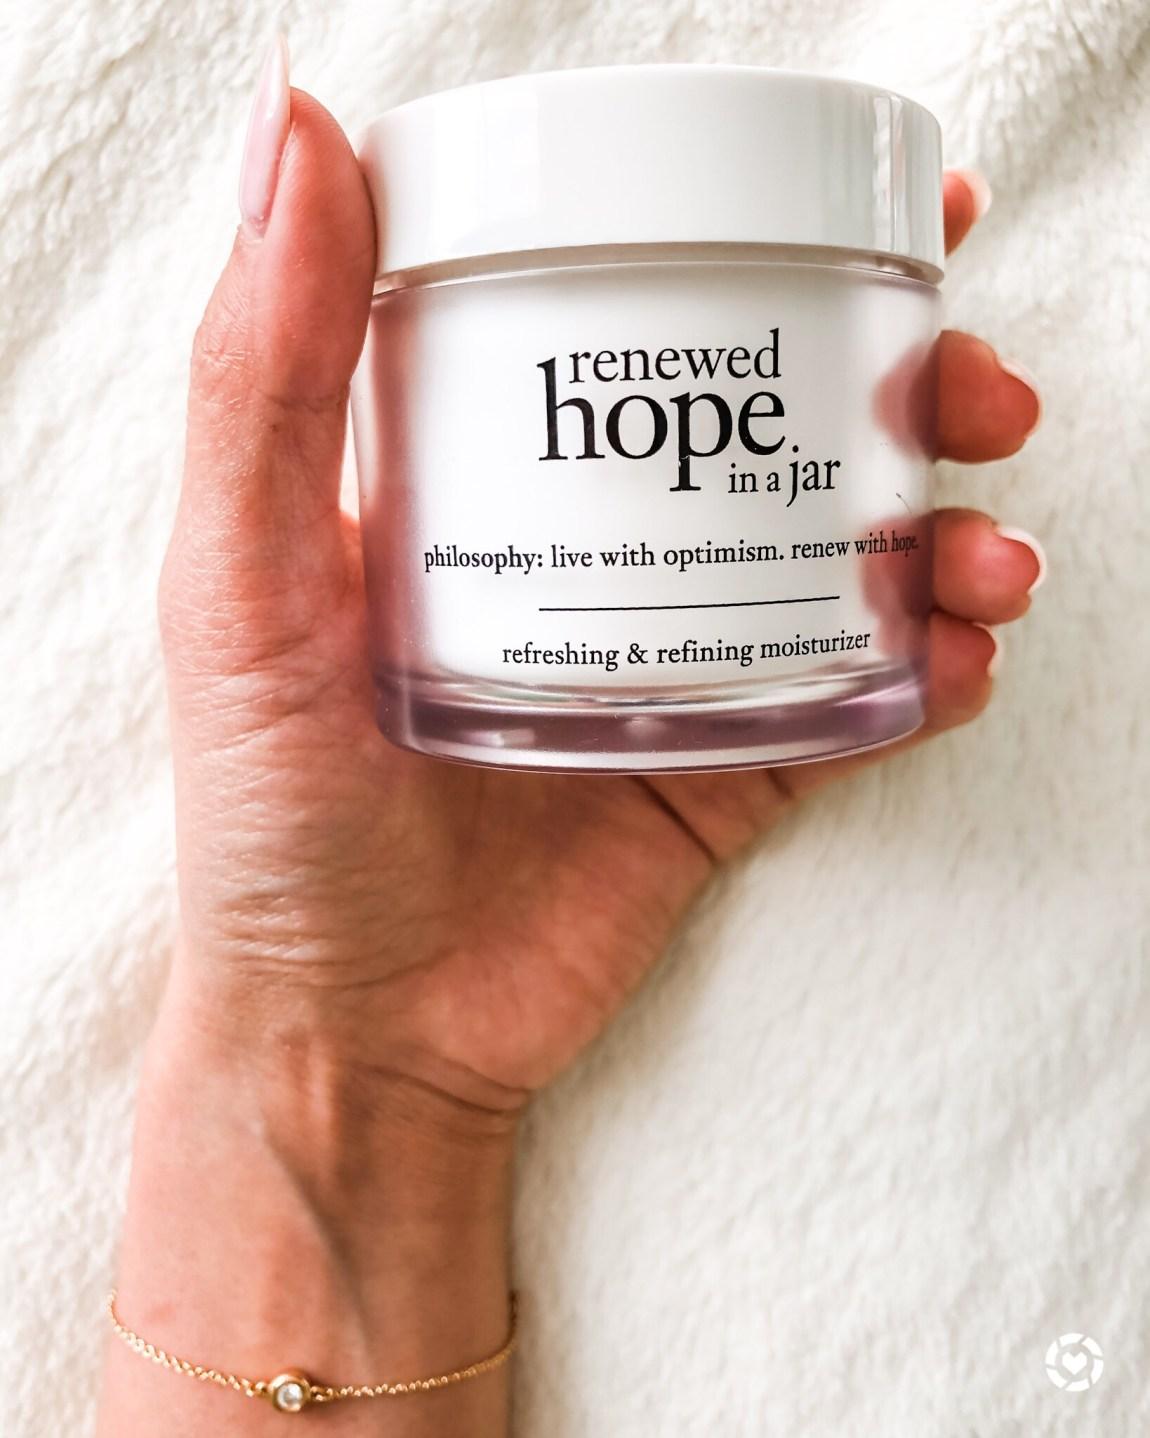 Philosophy Renewed Hope in a Jar Moisturizer